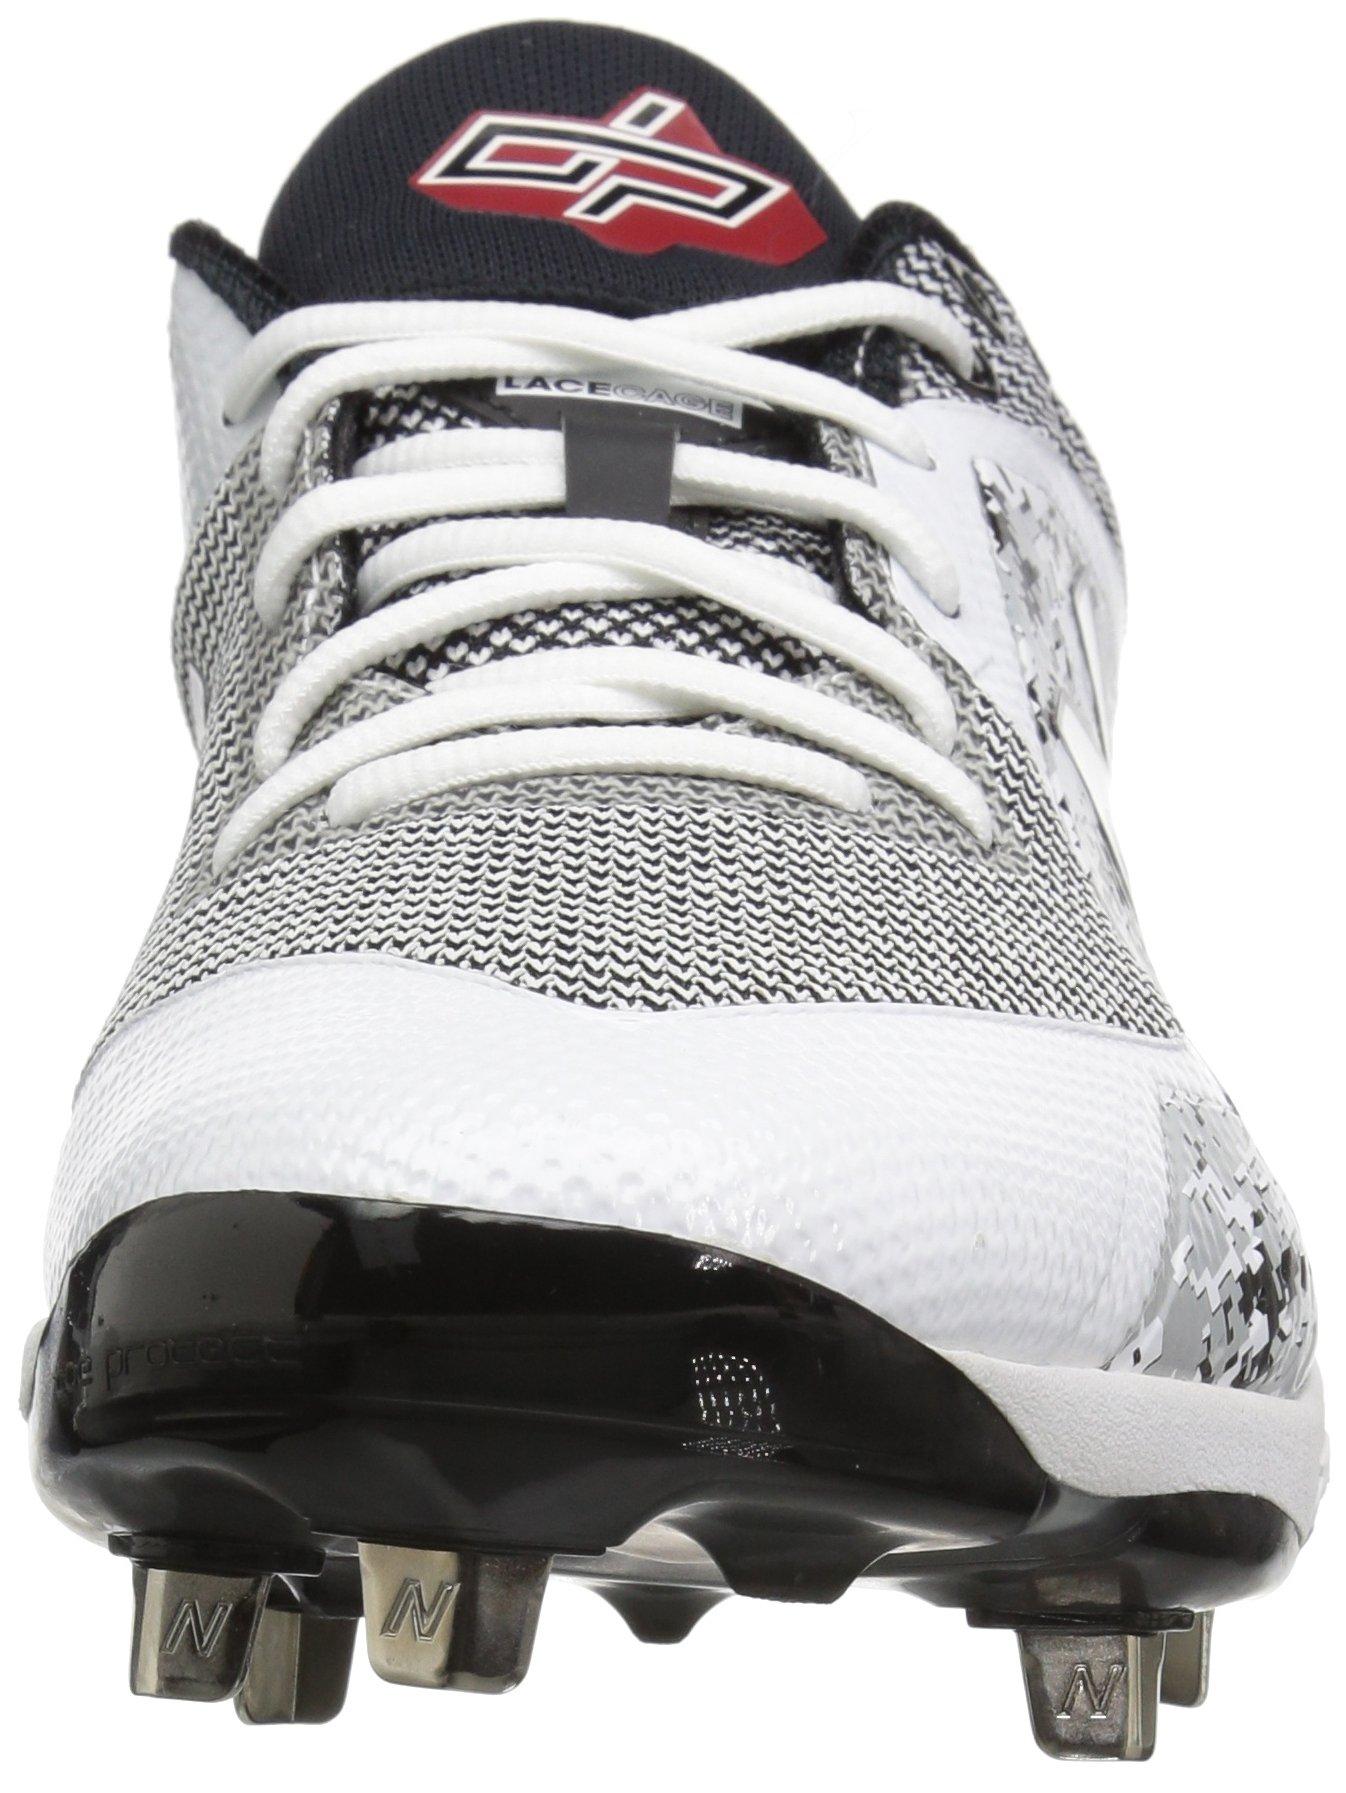 New Balance Men's L4040v4 Metal Baseball Shoe, Silver/Camo, 7.5 2E US by New Balance (Image #4)